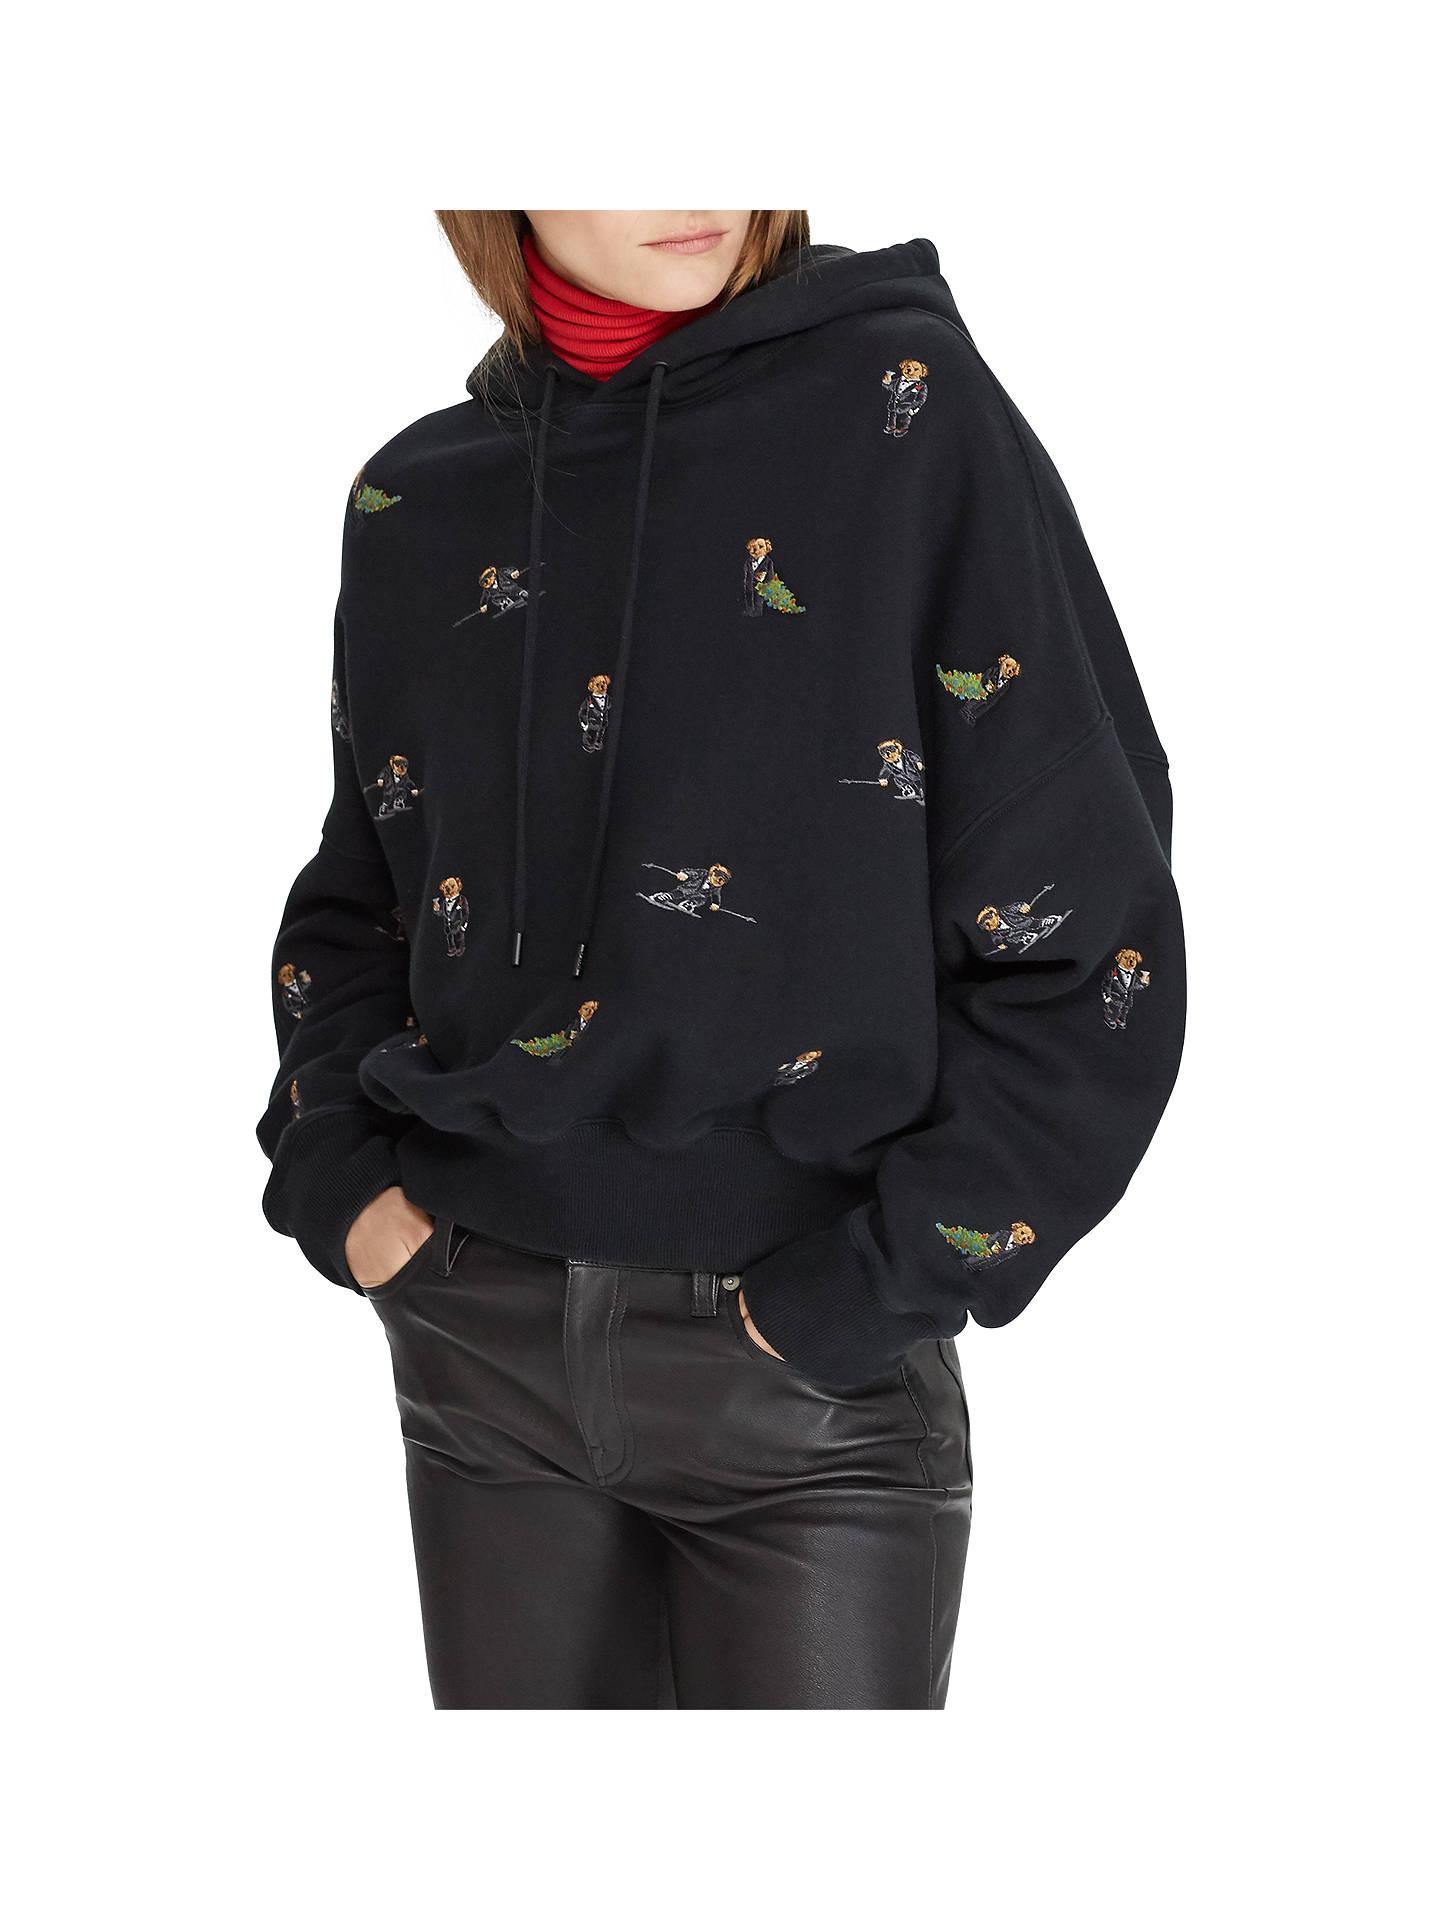 Polo Ralph Lauren Polo Bear Print Fleece Hoodie Black At